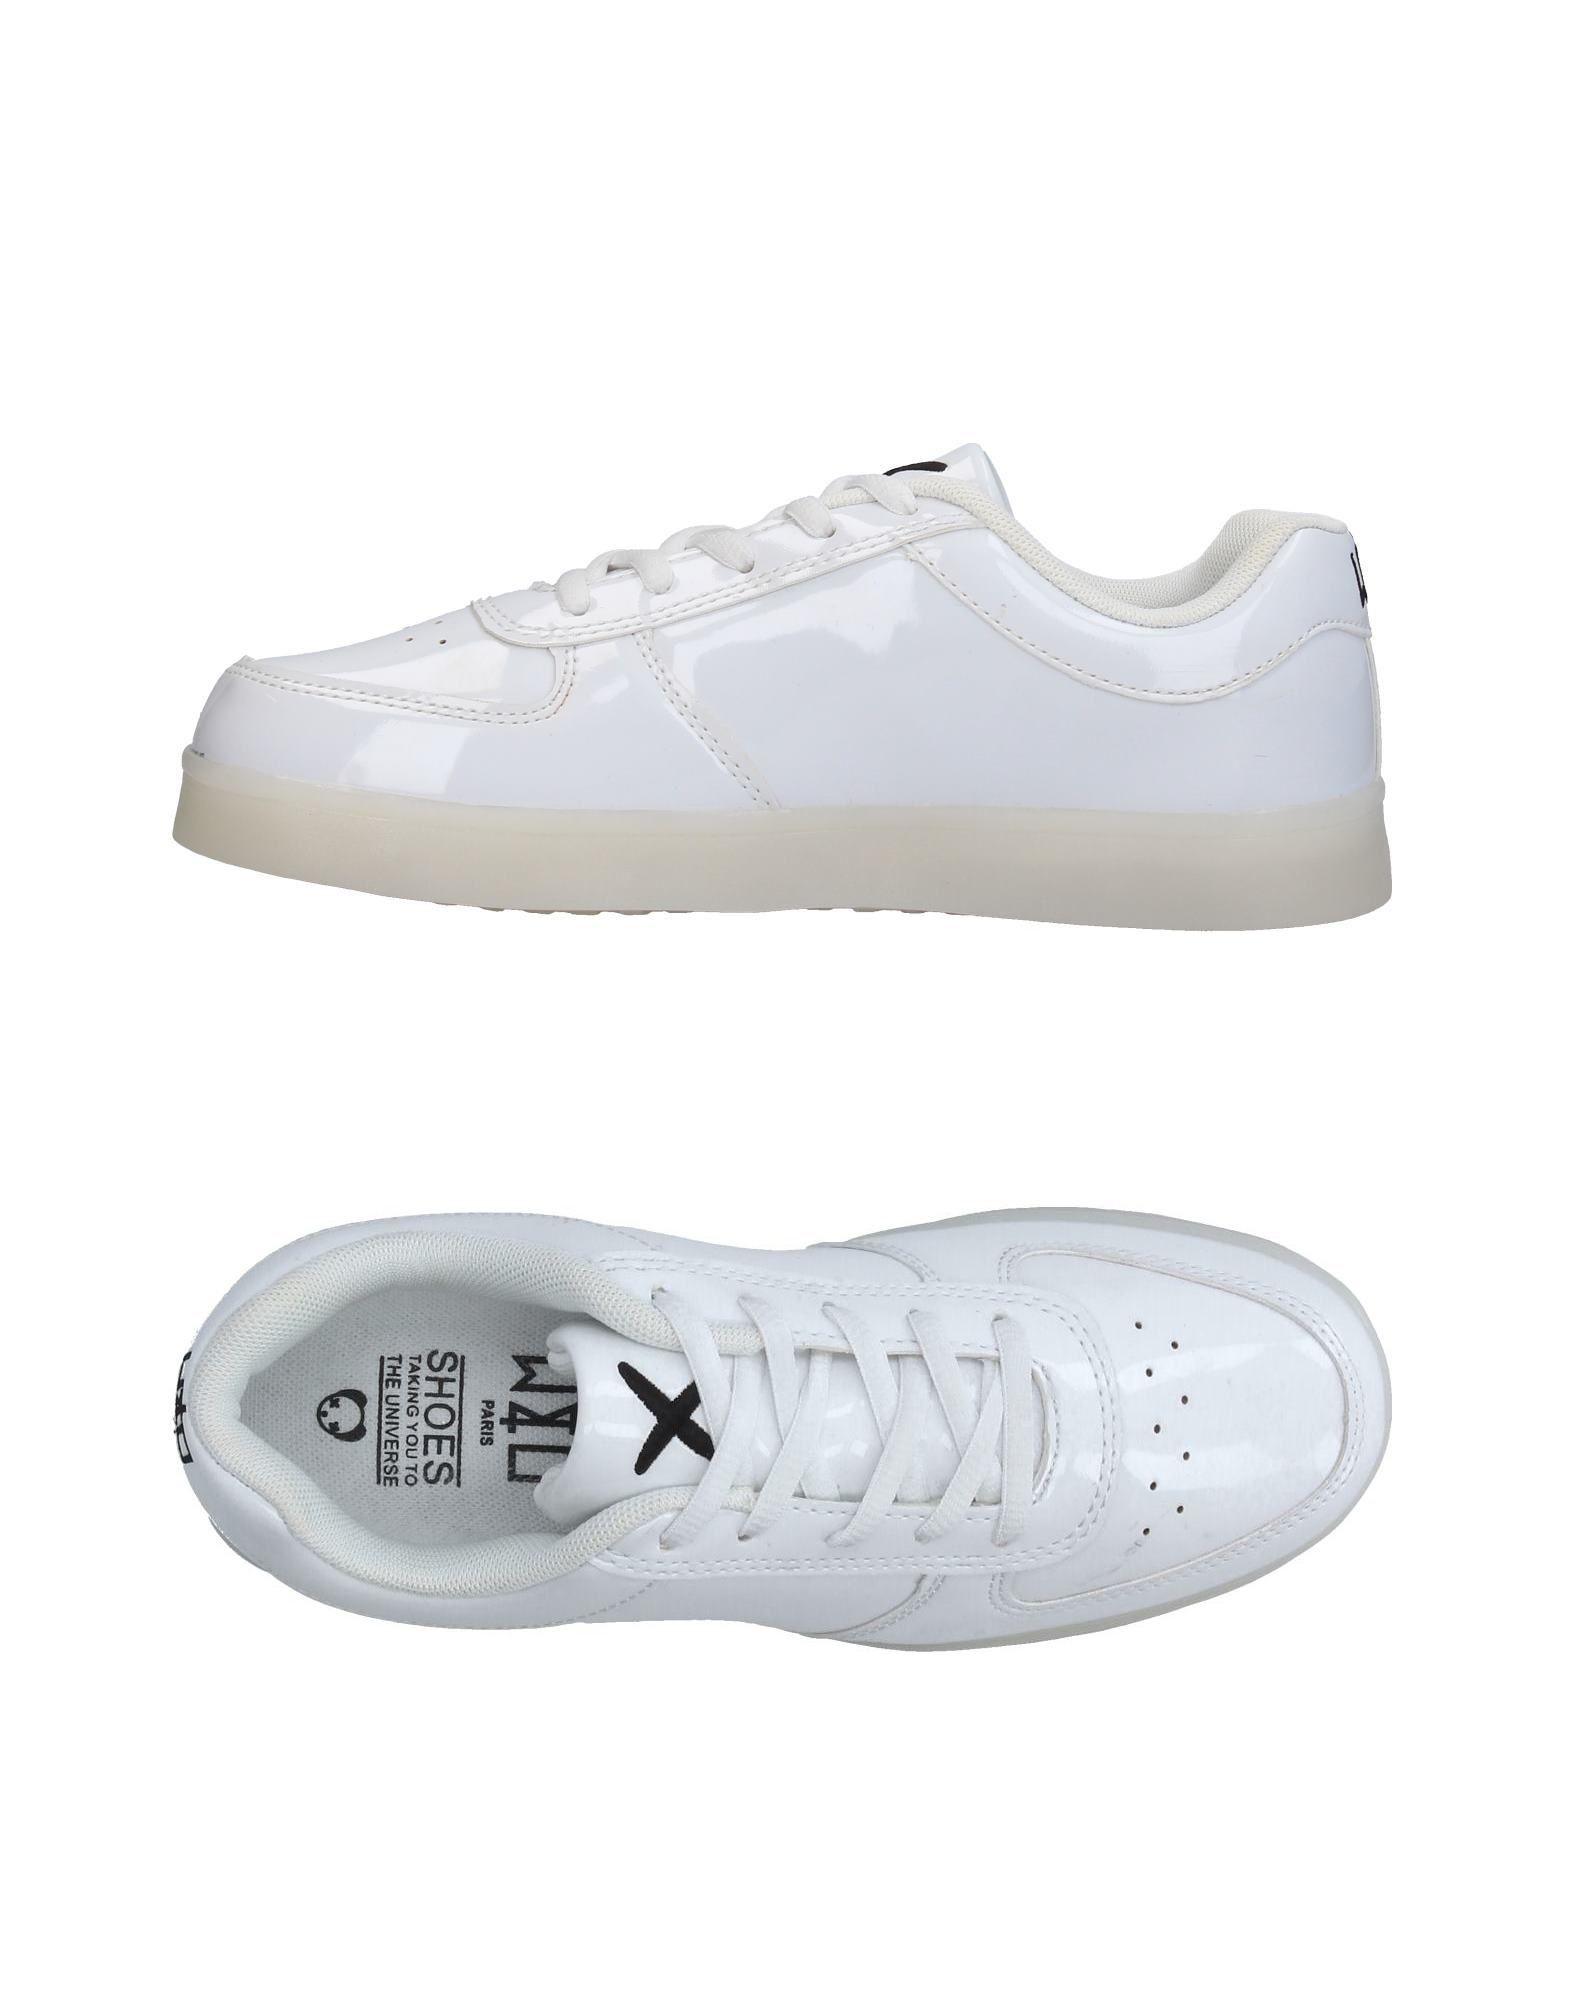 Wize & Ope Sneakers - Women Wize & Ope Sneakers Sneakers Sneakers online on  United Kingdom - 11360980TU ebd6c7